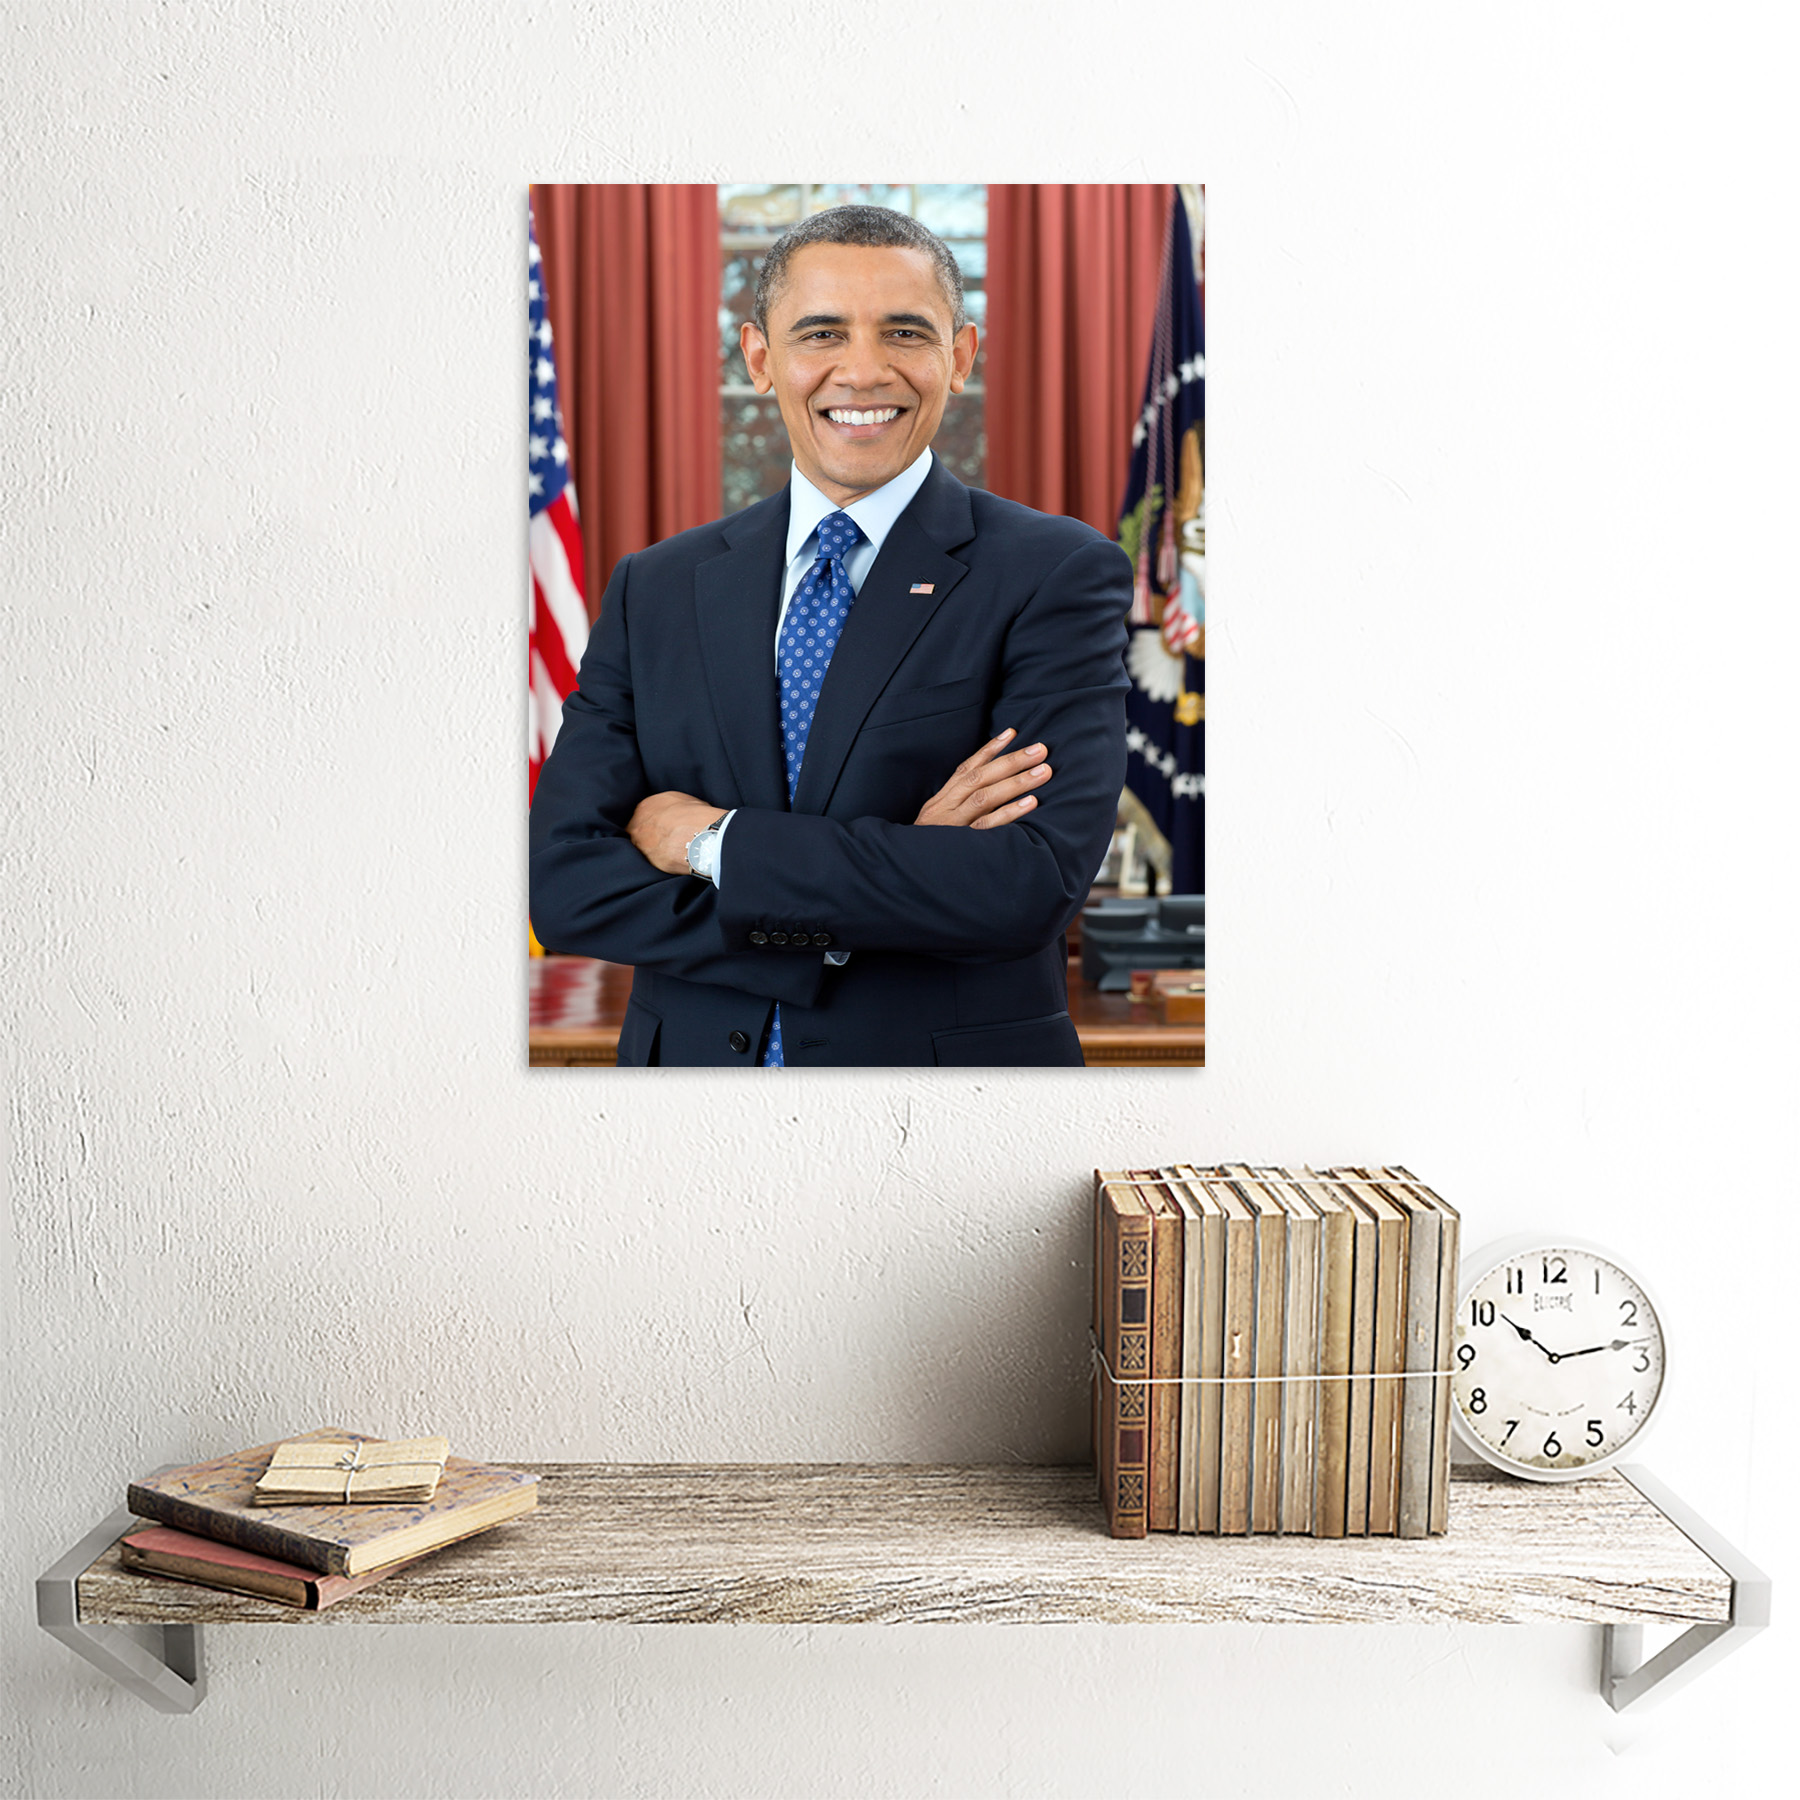 thumbnail 27 - Souza Portrait US President Barack Obama Photo Wall Art Print Framed 12x16